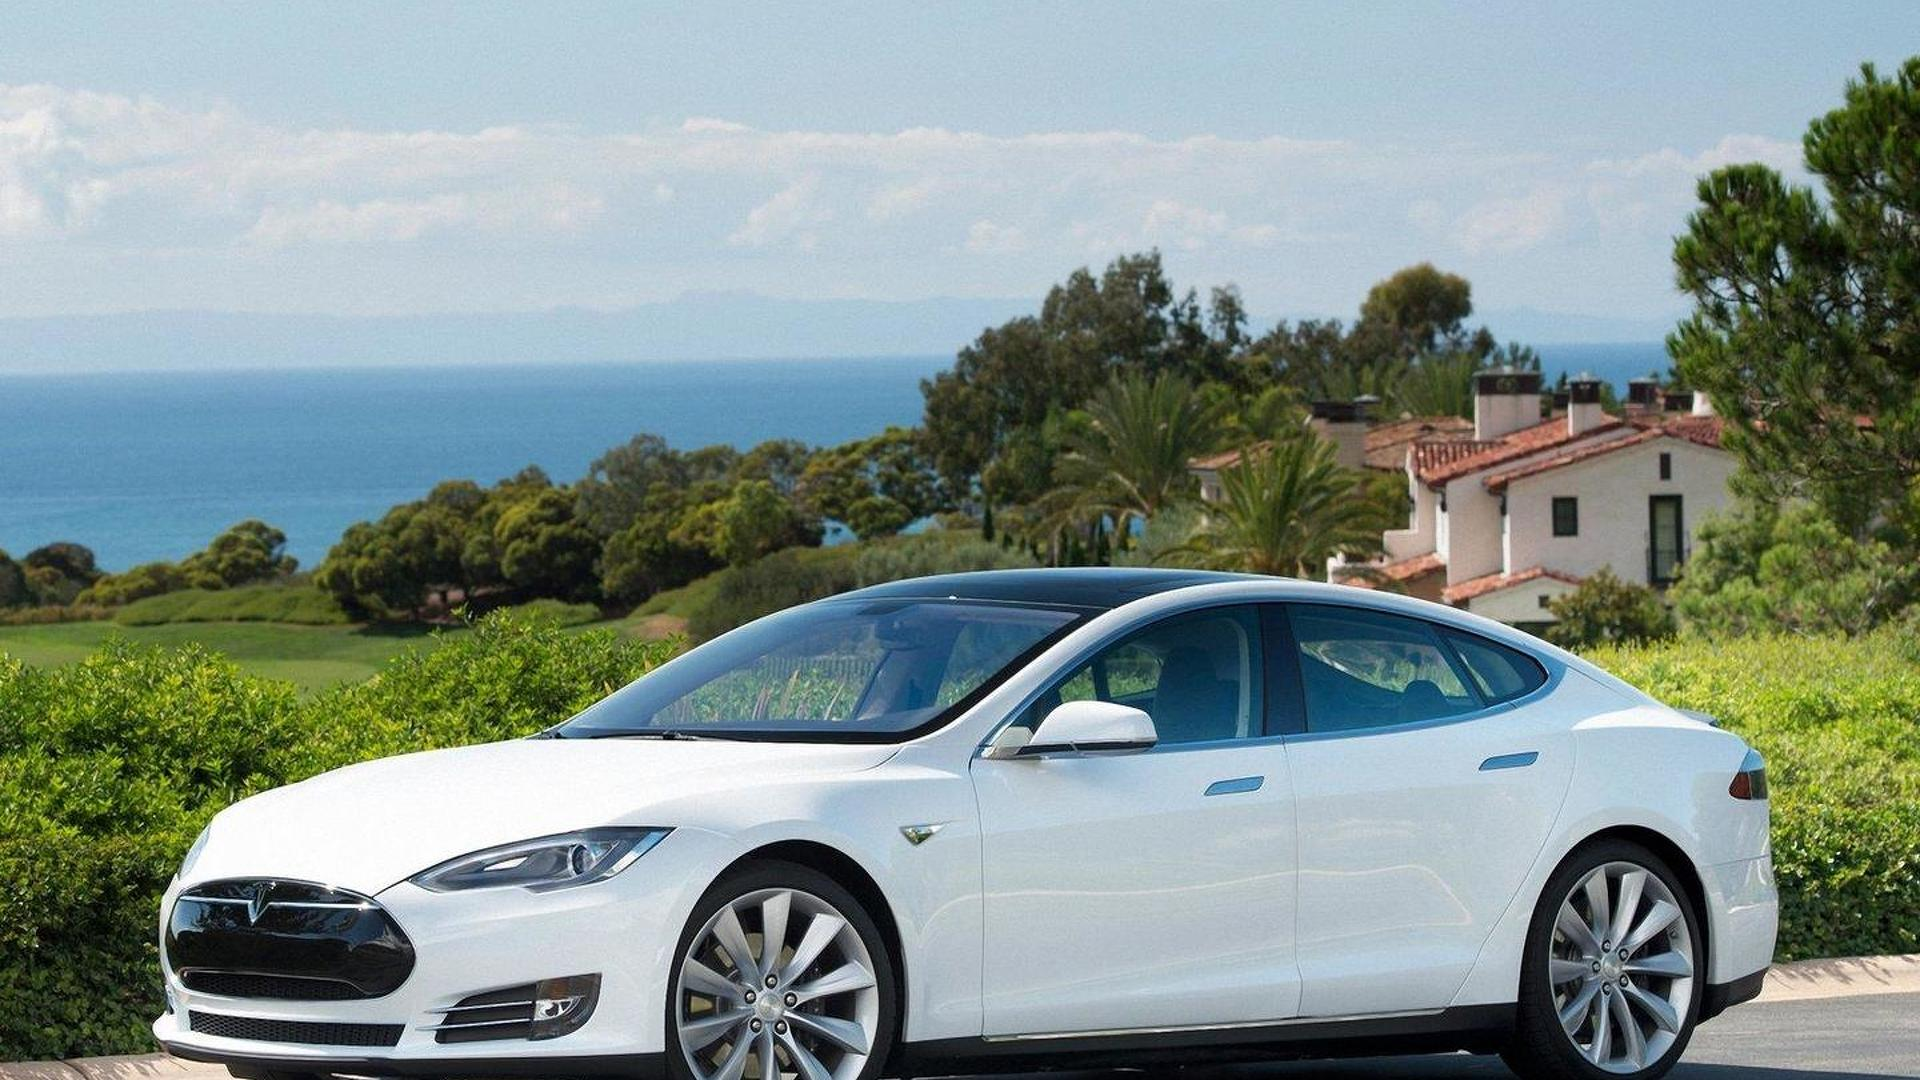 Tesla Model S hacking contest planned for next week, winner gets 10,000 USD